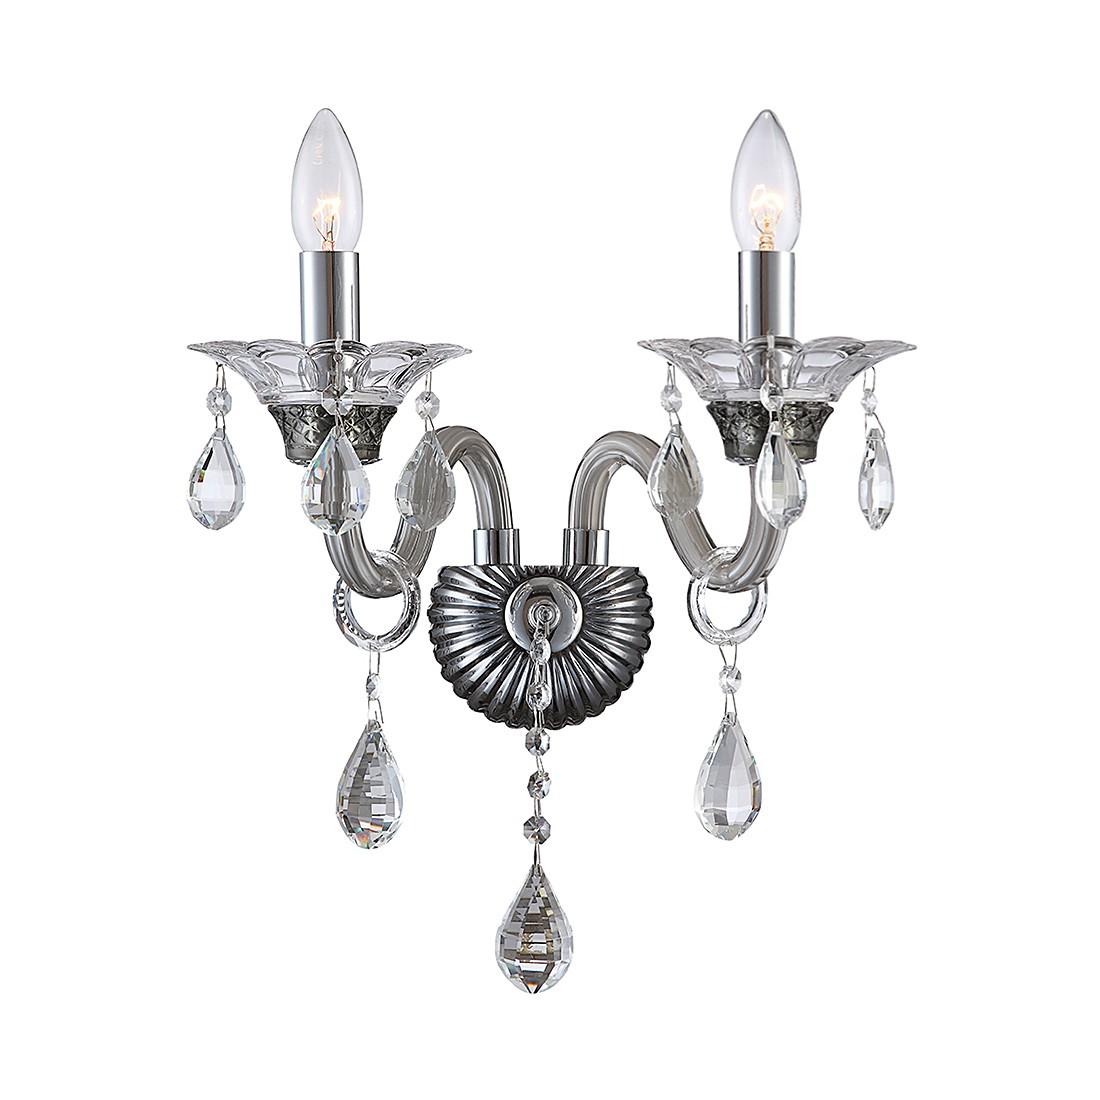 EEK A++, Wandleuchte Dunja - Metall - Silber - 2-flammig, Globo Lighting